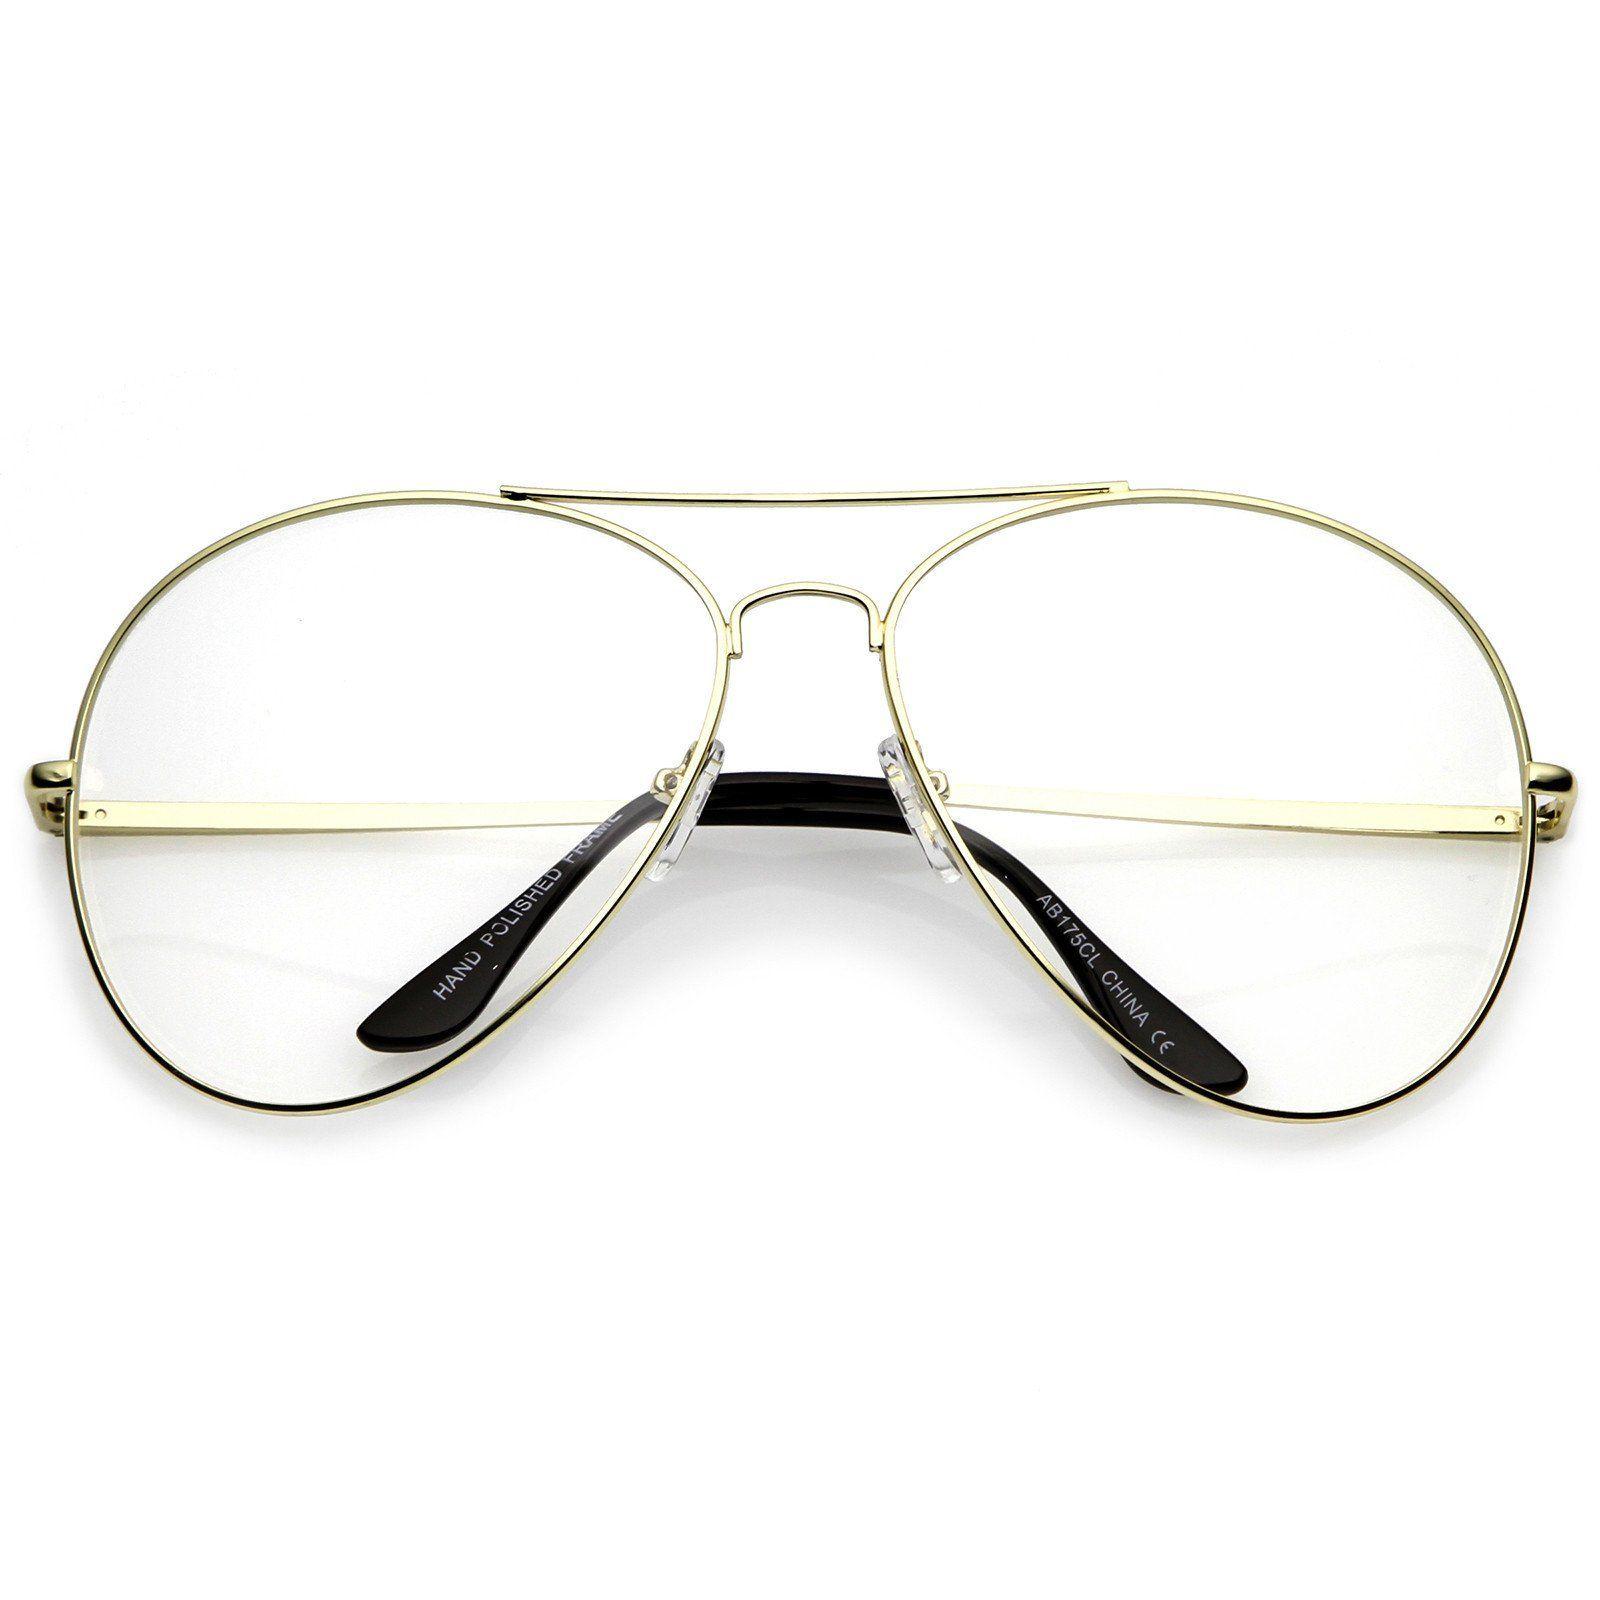 635fd1031b10 Classic Oversize Aviator Glasses With Metal Double Crossbar Teardrop Clear  Lens 63mm #clear #frame #sunglassla #womens #oversized #purple #bold # sunglass ...